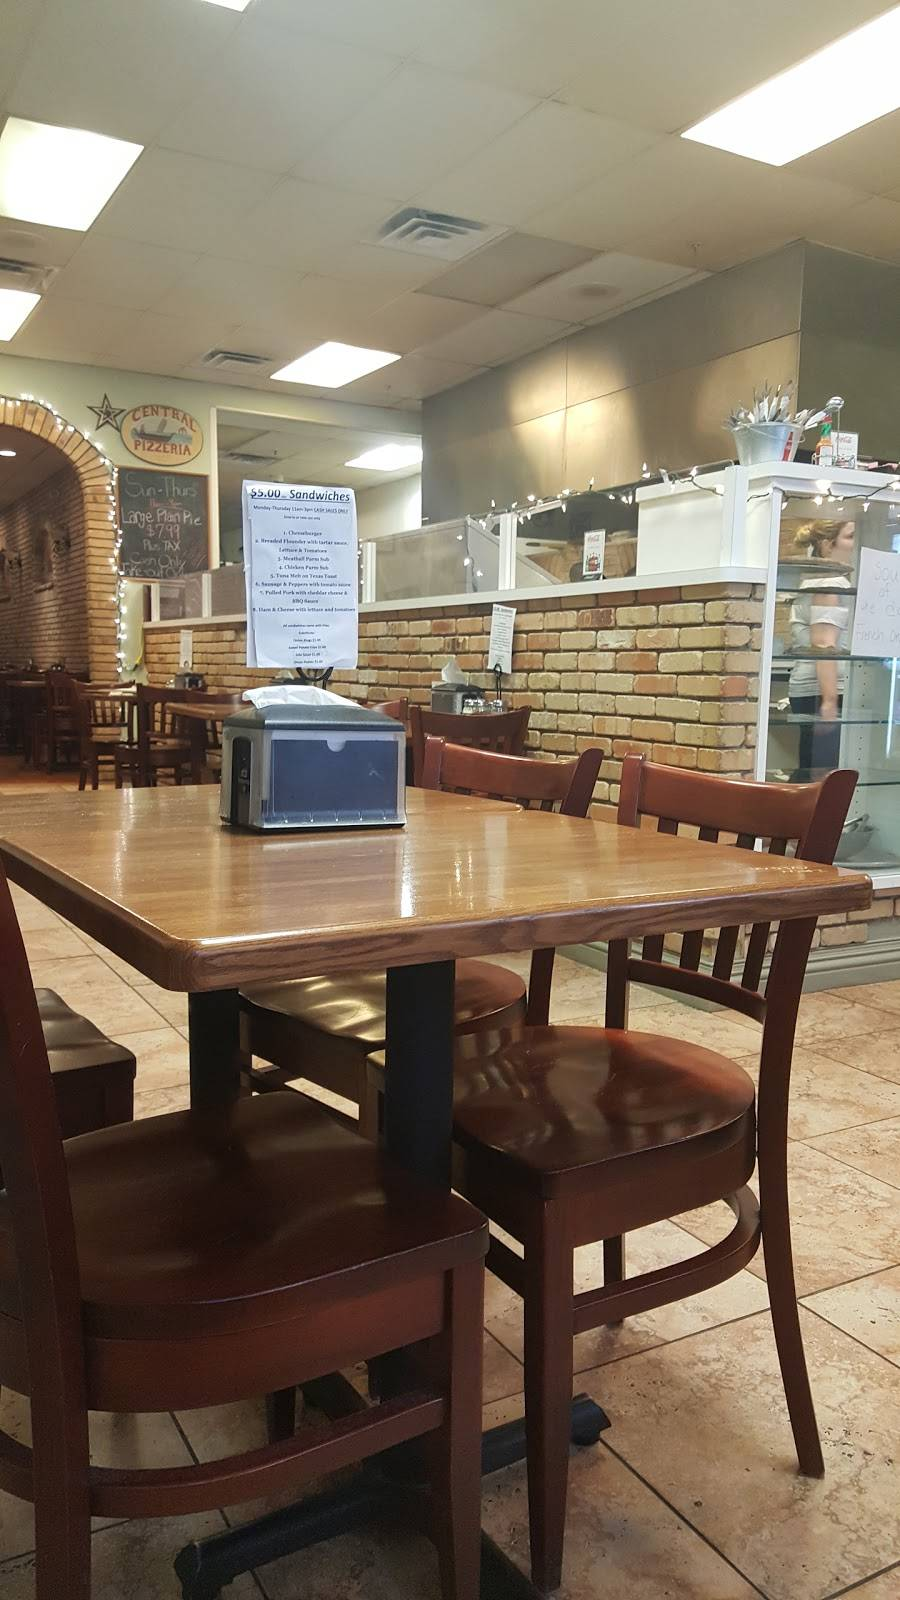 Central Pizzeria   restaurant   126 W Main St, Somerville, NJ 08876, USA   9087228272 OR +1 908-722-8272